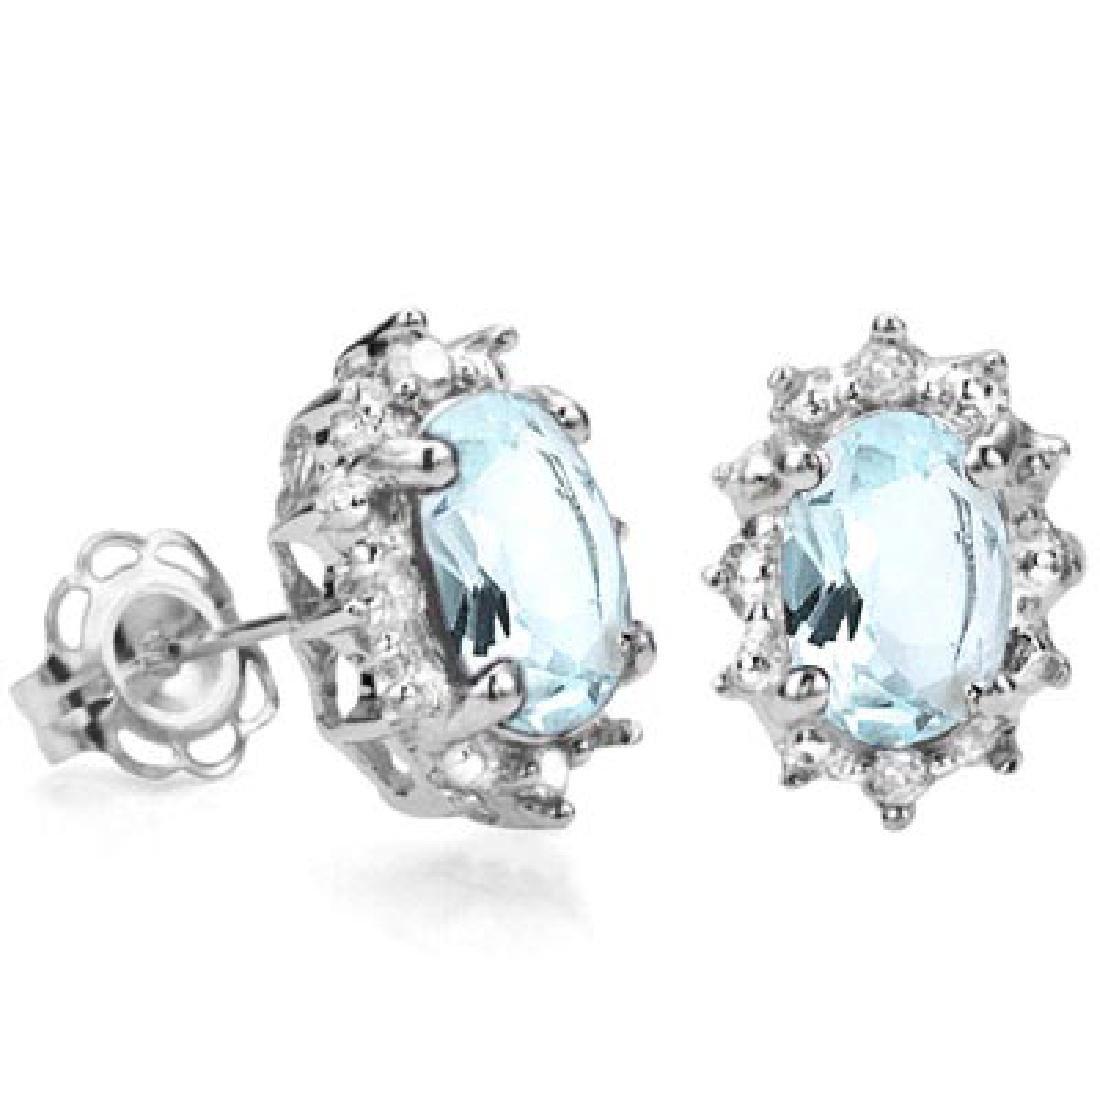 IDEAL 3/4 CARAT AQUAMARINE & DIAMOND 925 STERLING SILVE